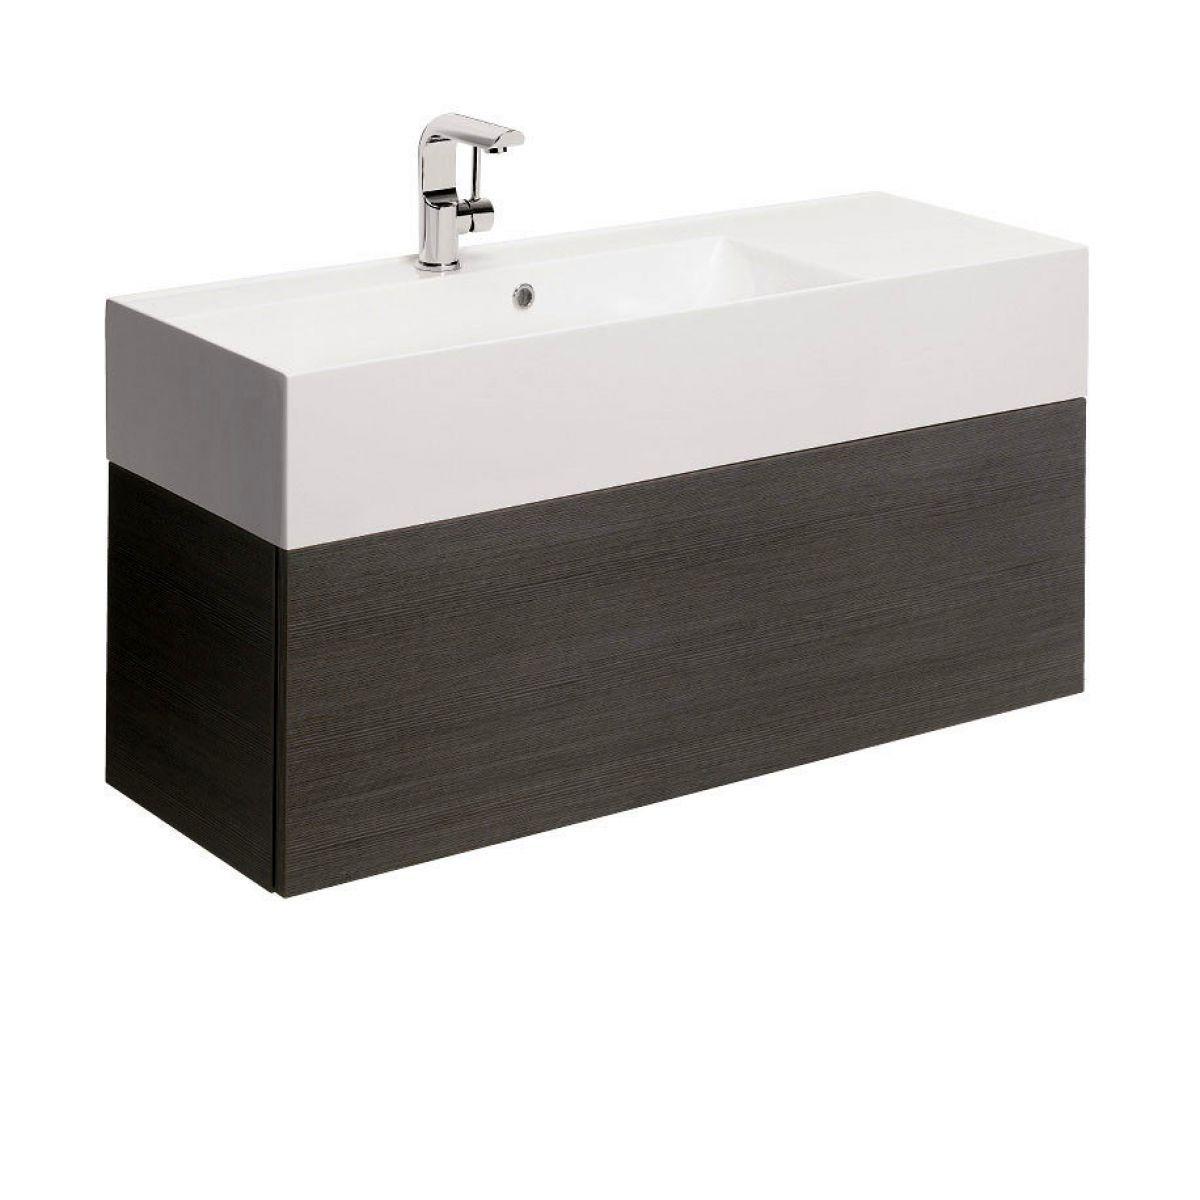 Crosswater Elite Vanity Unit and Basin Basin vanity unit